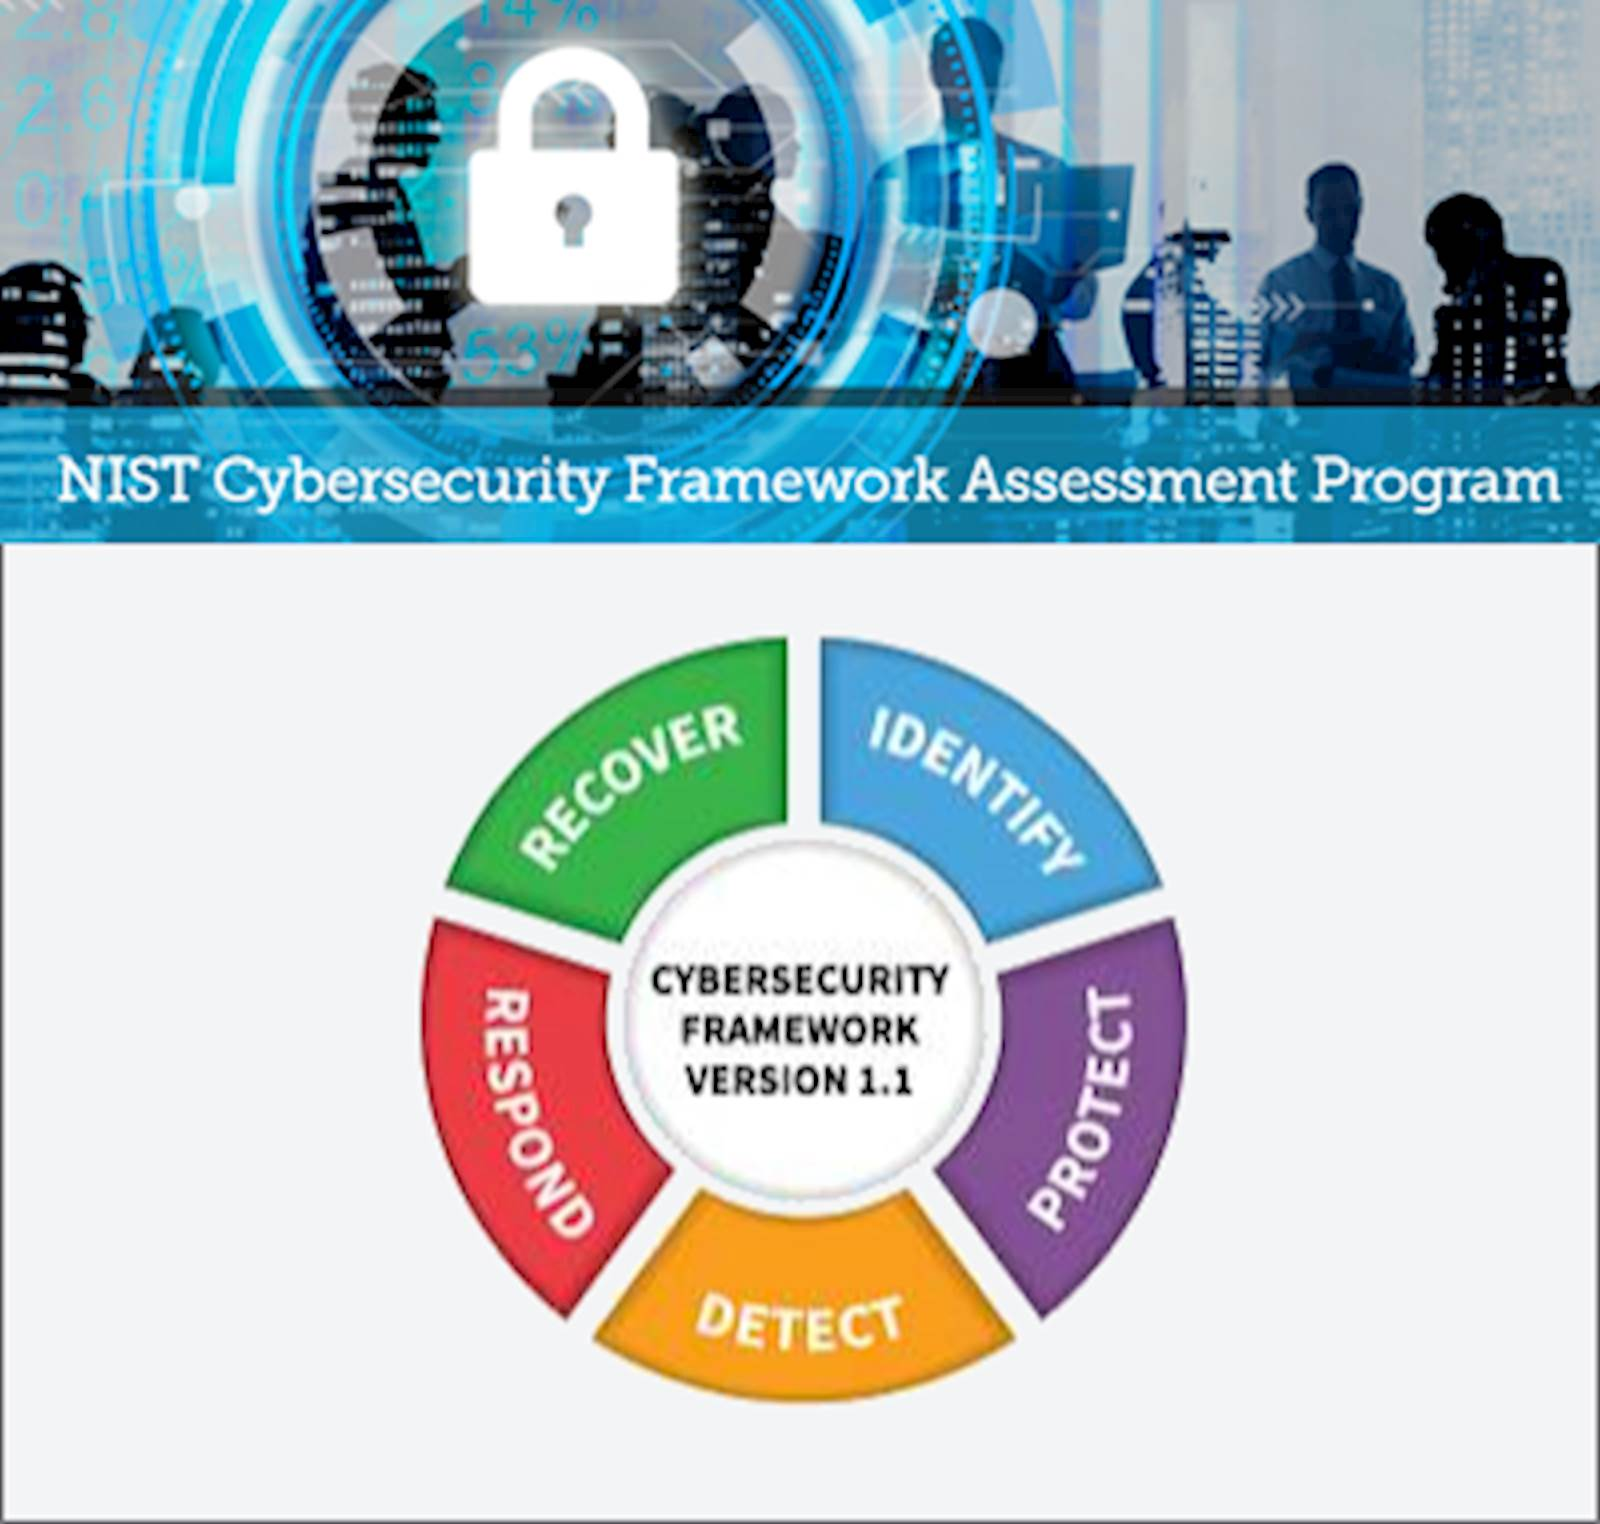 NIST Cybersecurity Framework Training | LRS Education